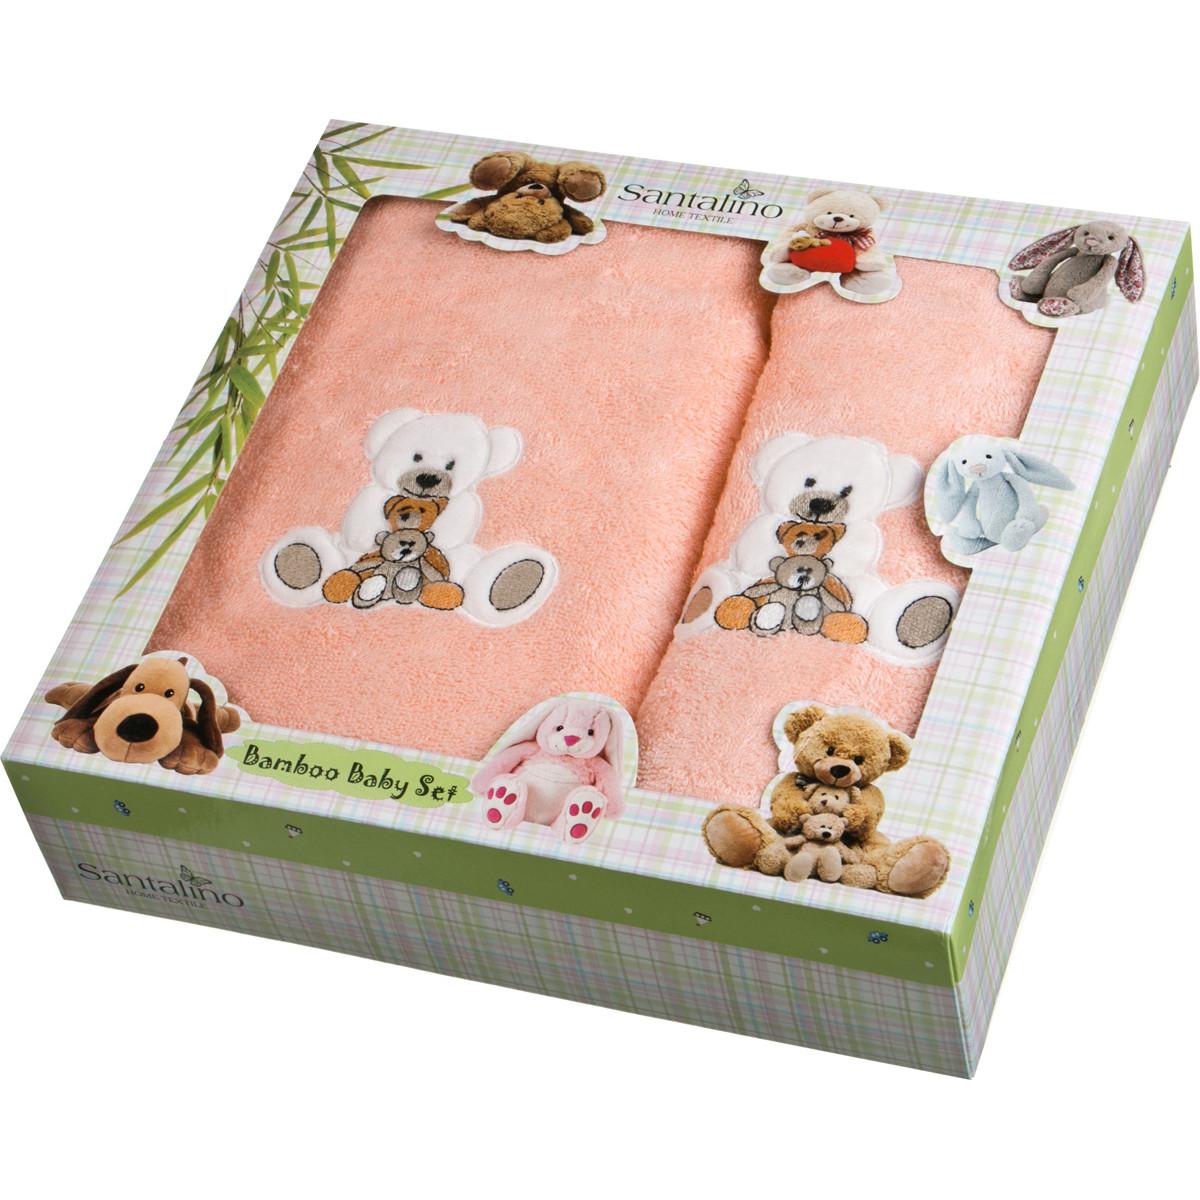 Полотенца Santalino Детское полотенце Ariel  (50х90 см,70х140 см) bravo полотенце детское пони 33 x 70 см 1089